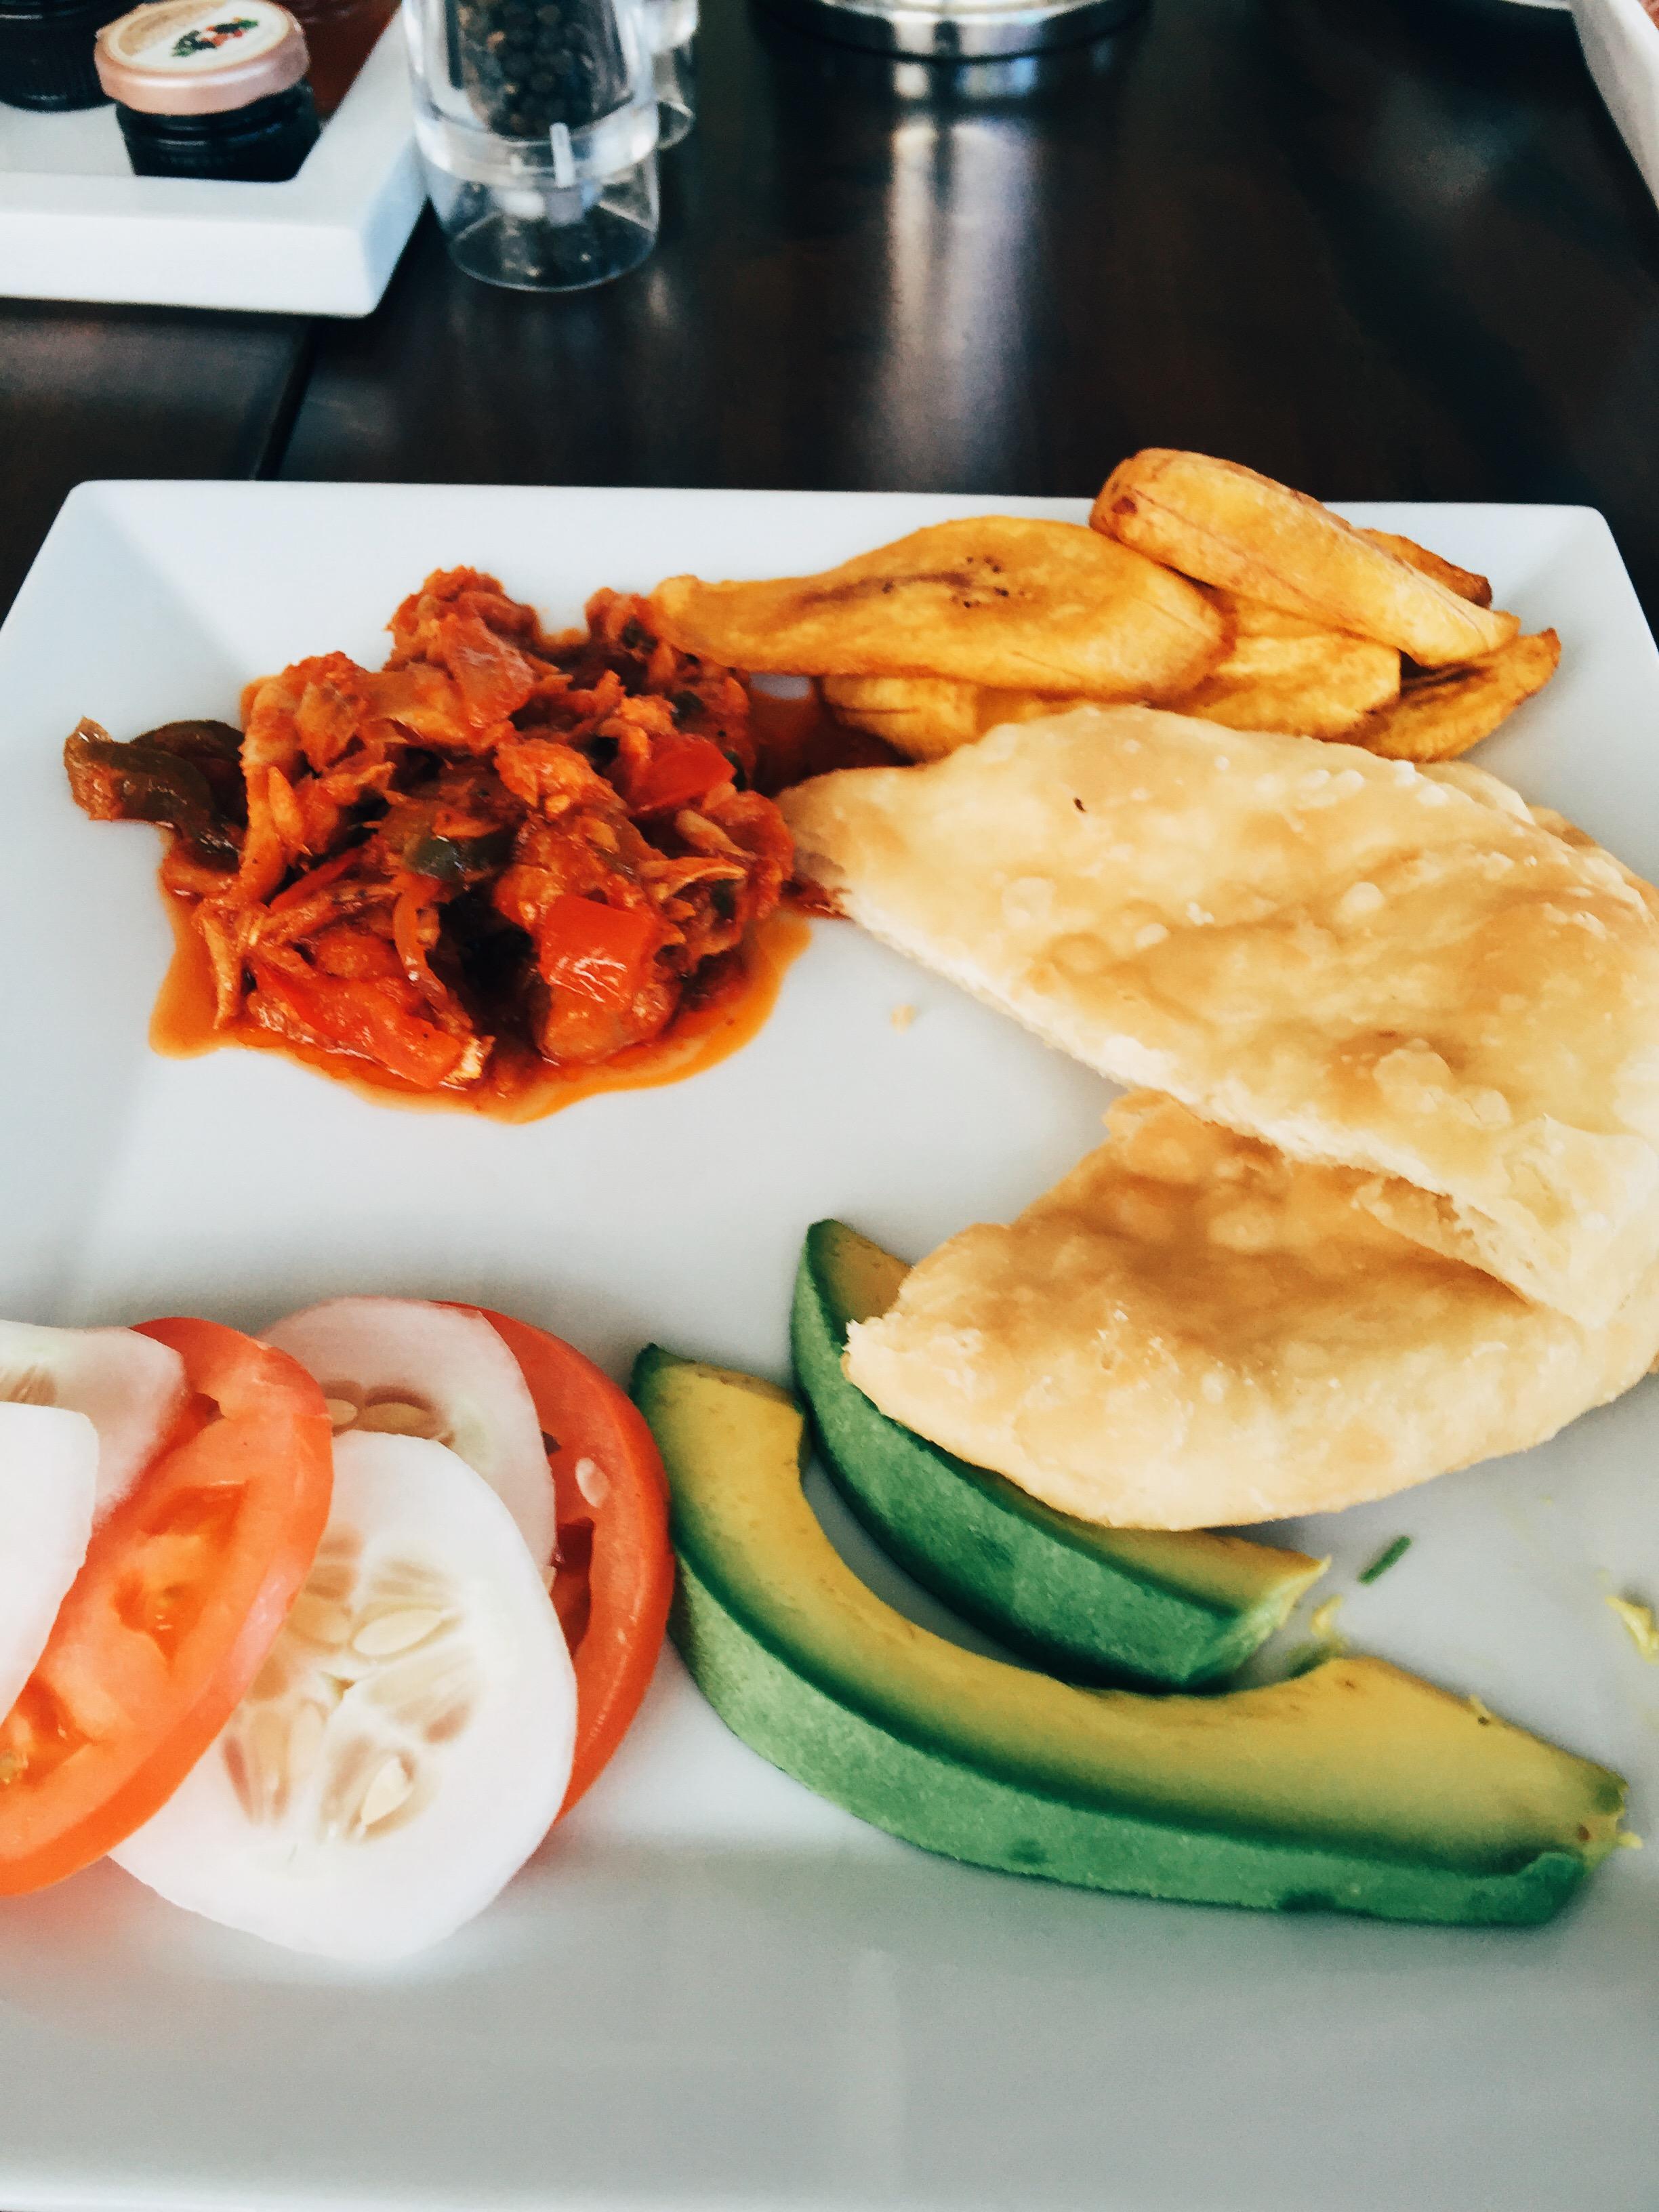 The Signature Caribbean Breakfast